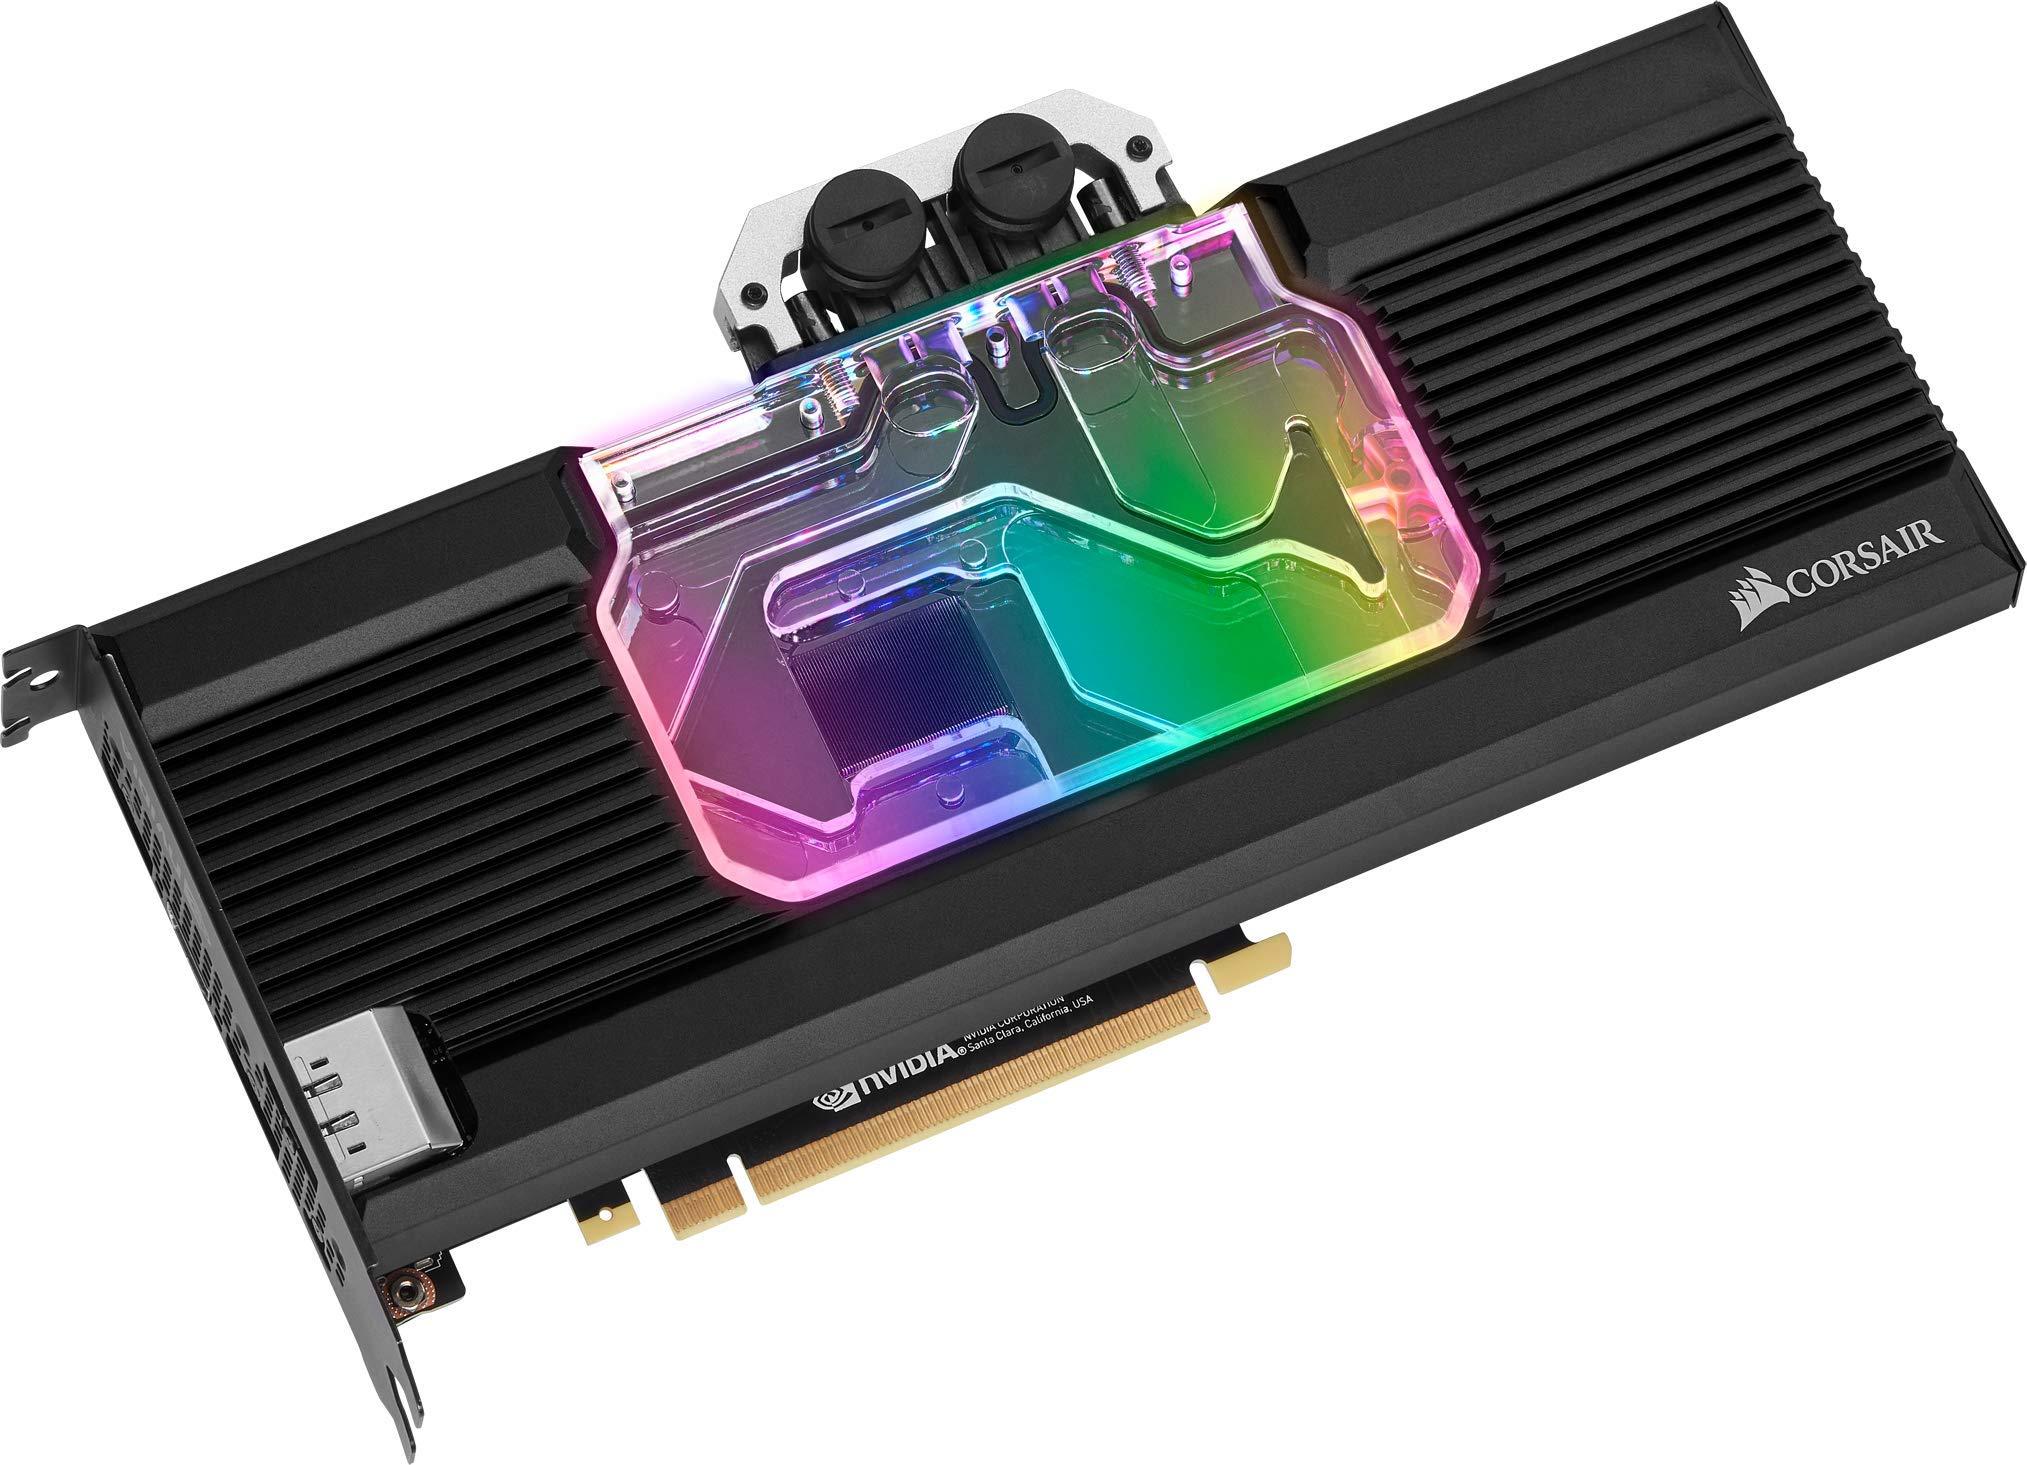 Corsair Hydro X Series, XG7 RGB GPU Water Block, 20-Series, GeForce RTX 2080 Ti Reference by Corsair